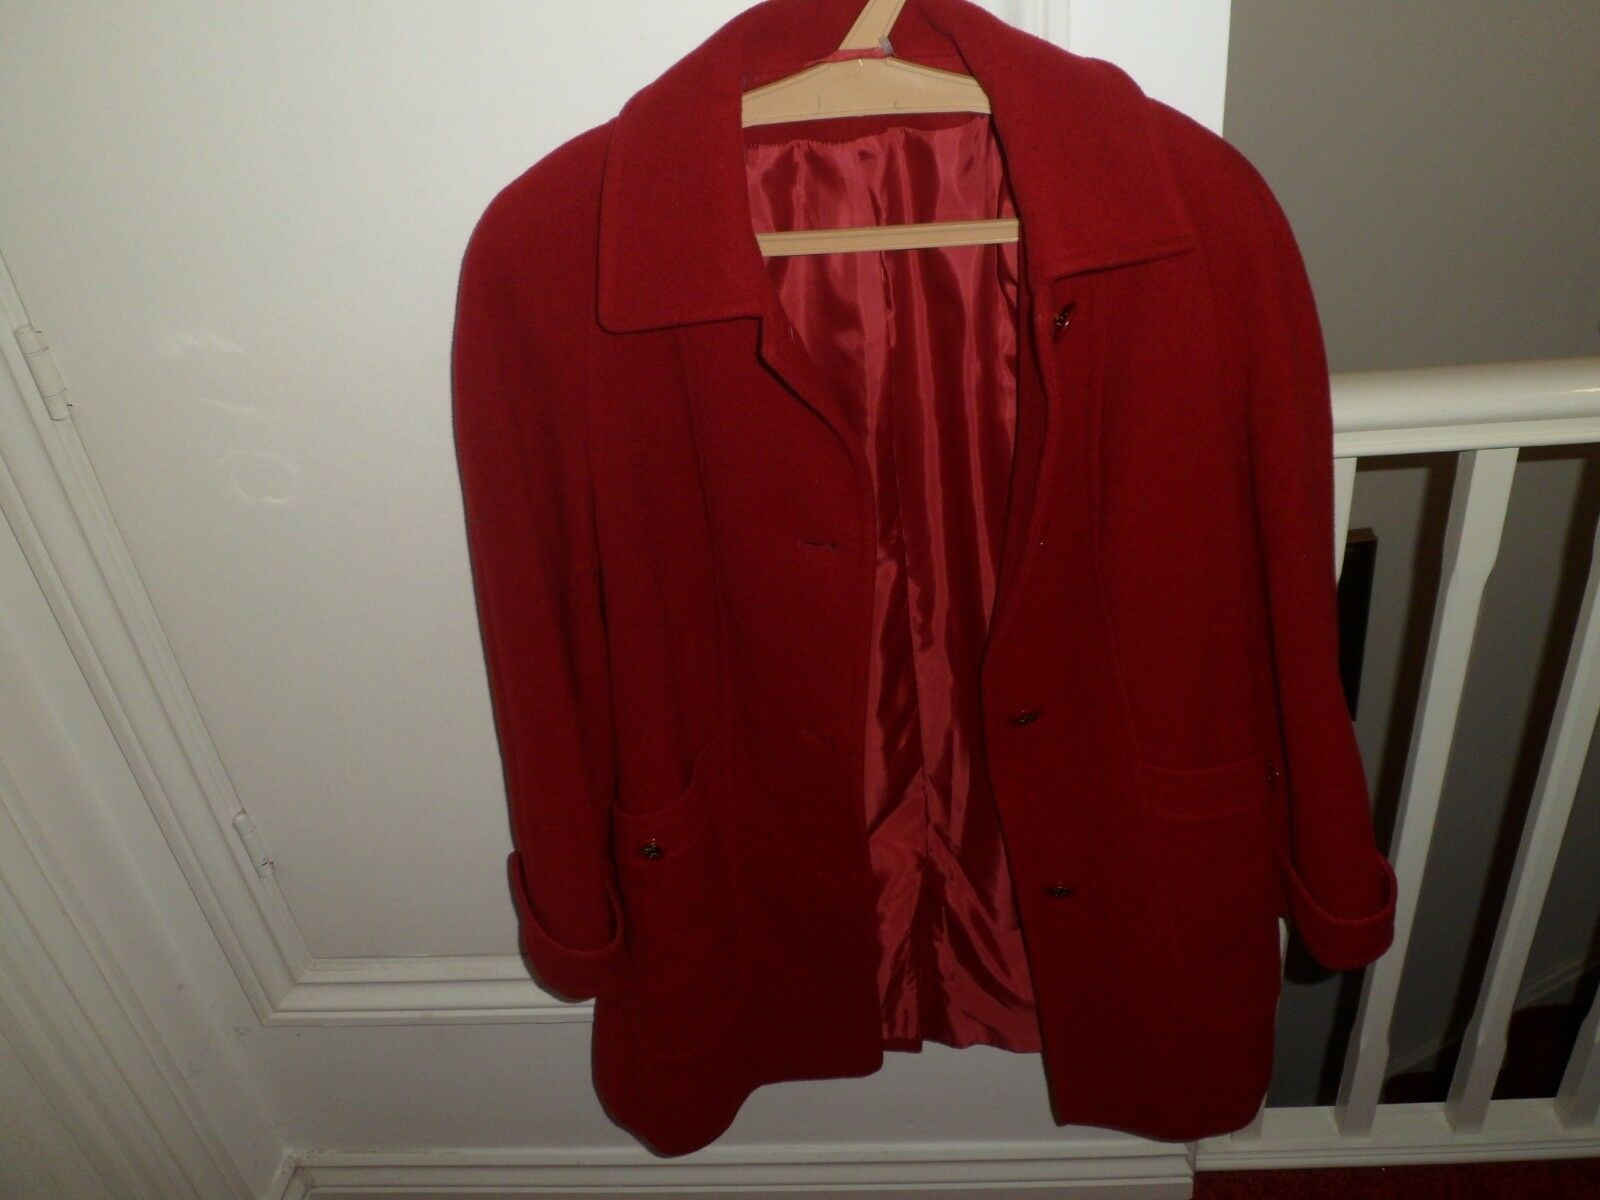 Heavy duty coat, EWM, Pure Classics, 10, WOOLMARK BLEND, Red, P2P 50CM. 80% Wool